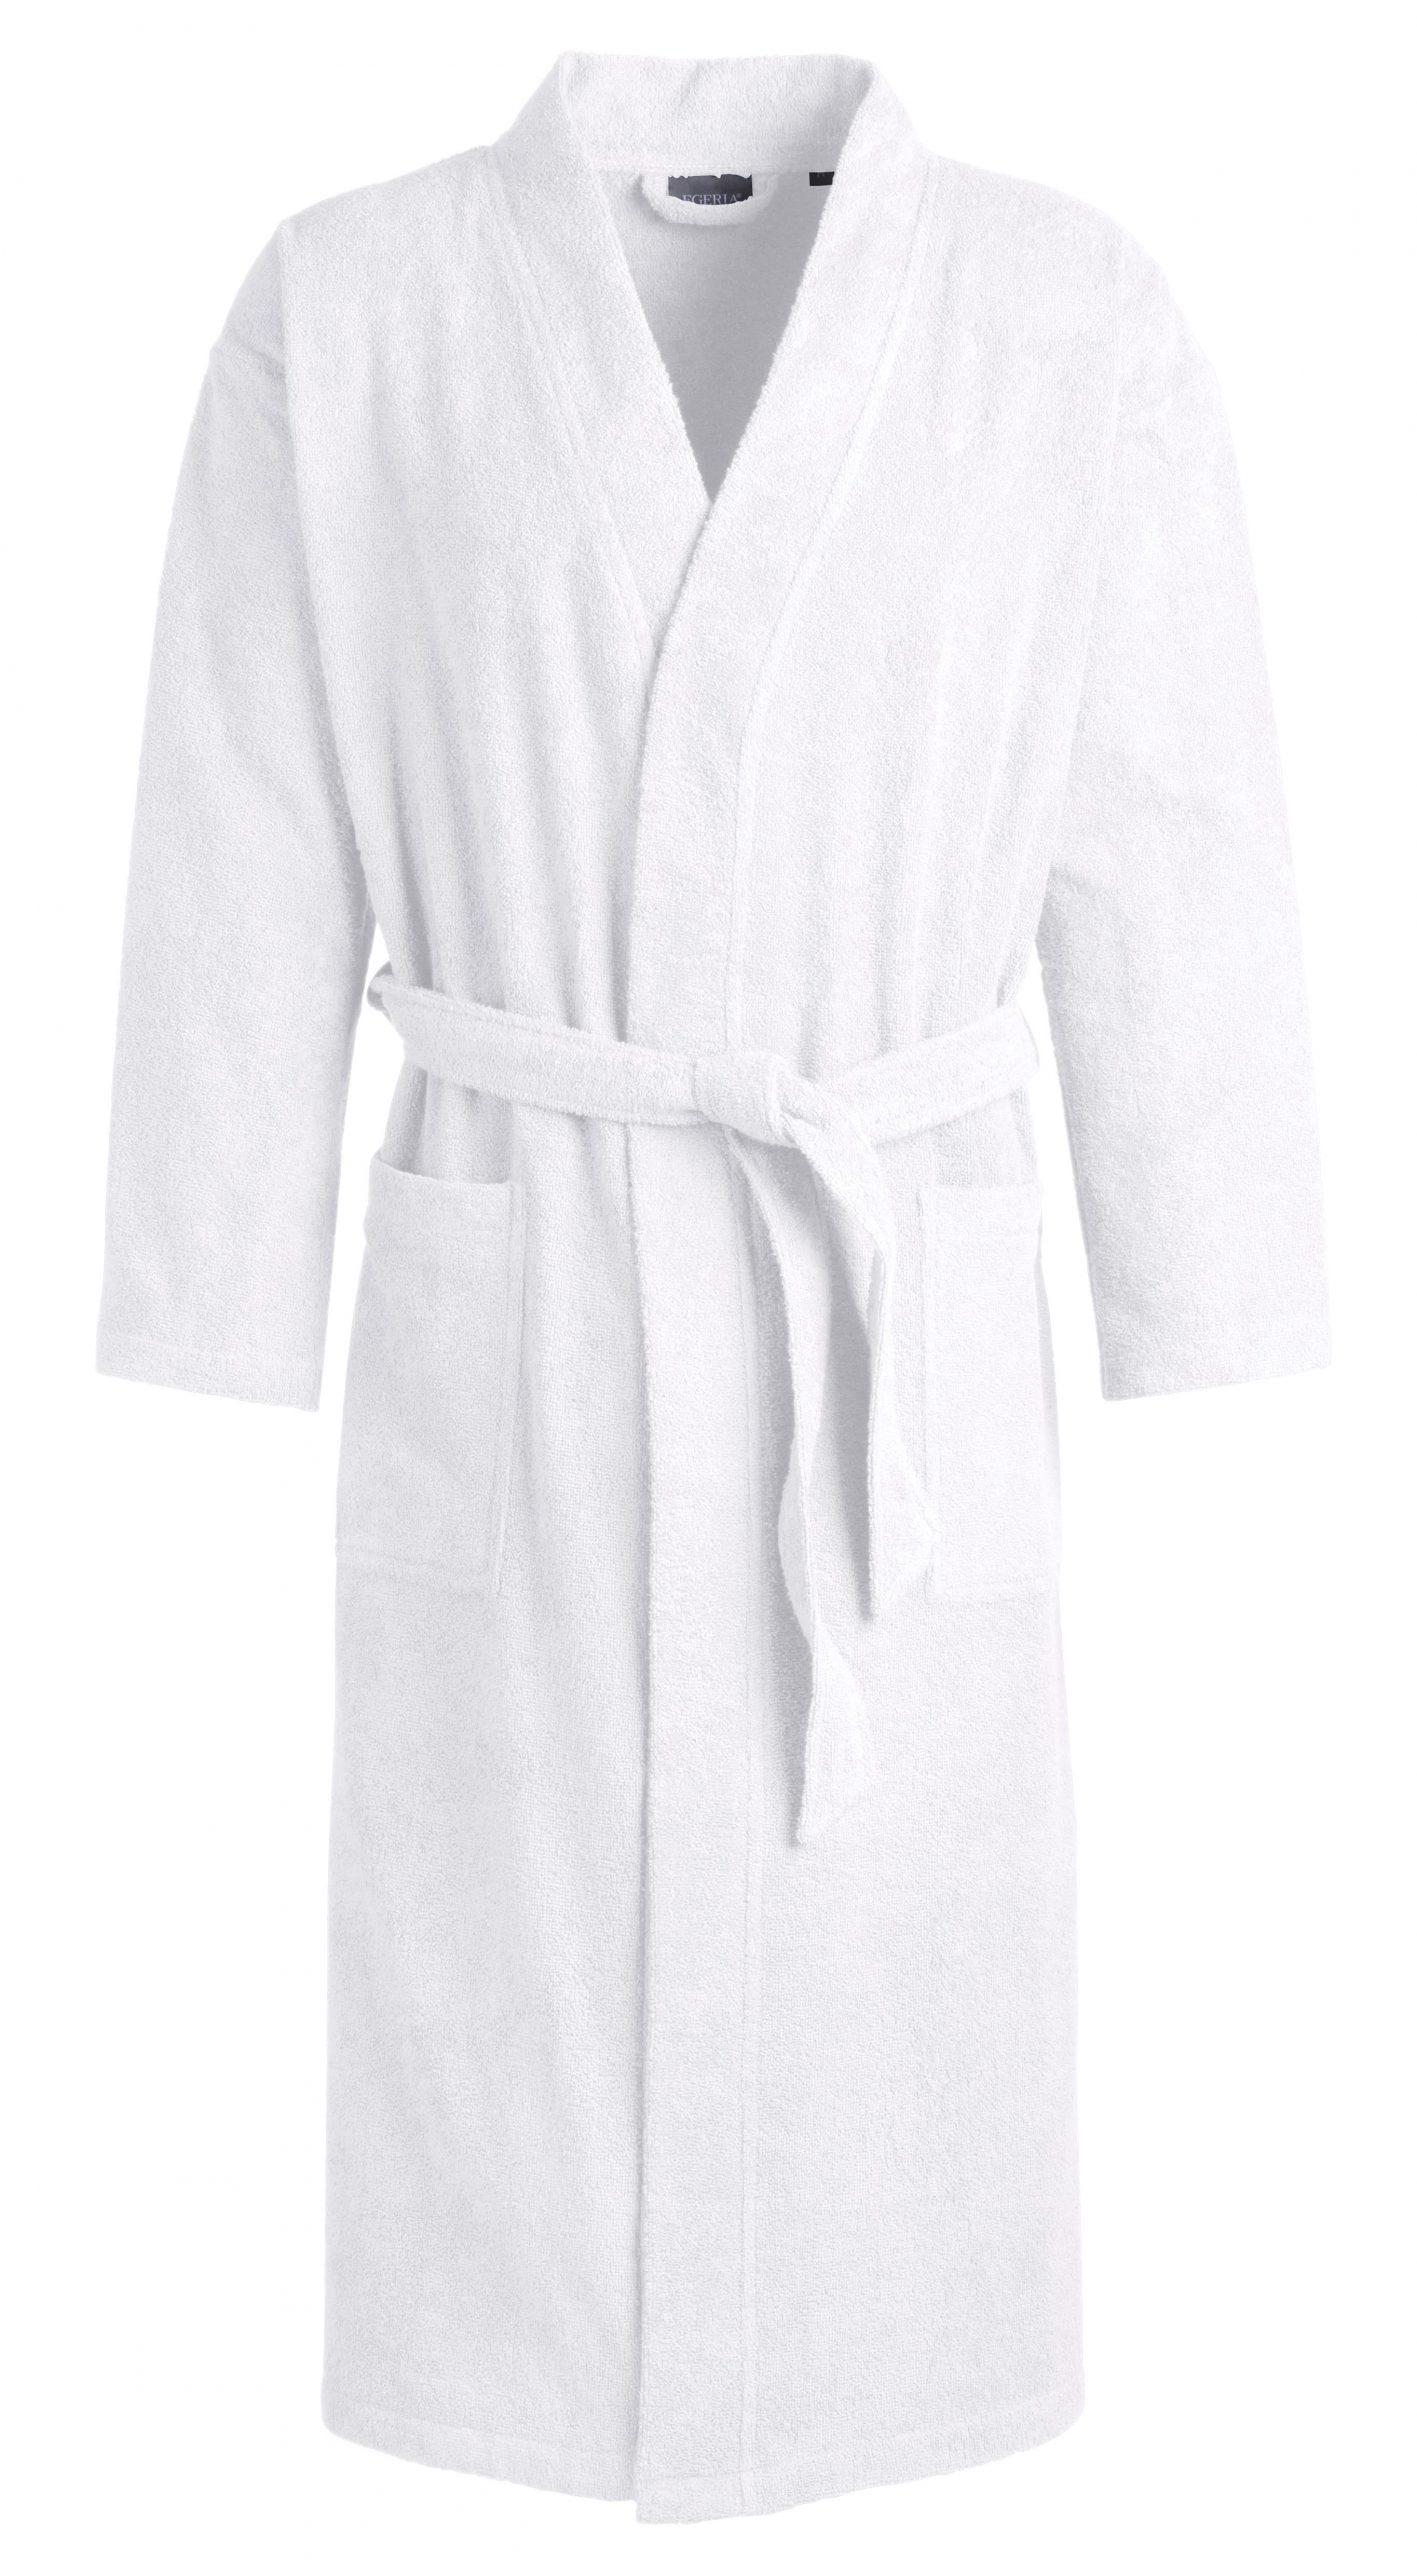 Witte badstof badjas kimonomodel van Egeria-0